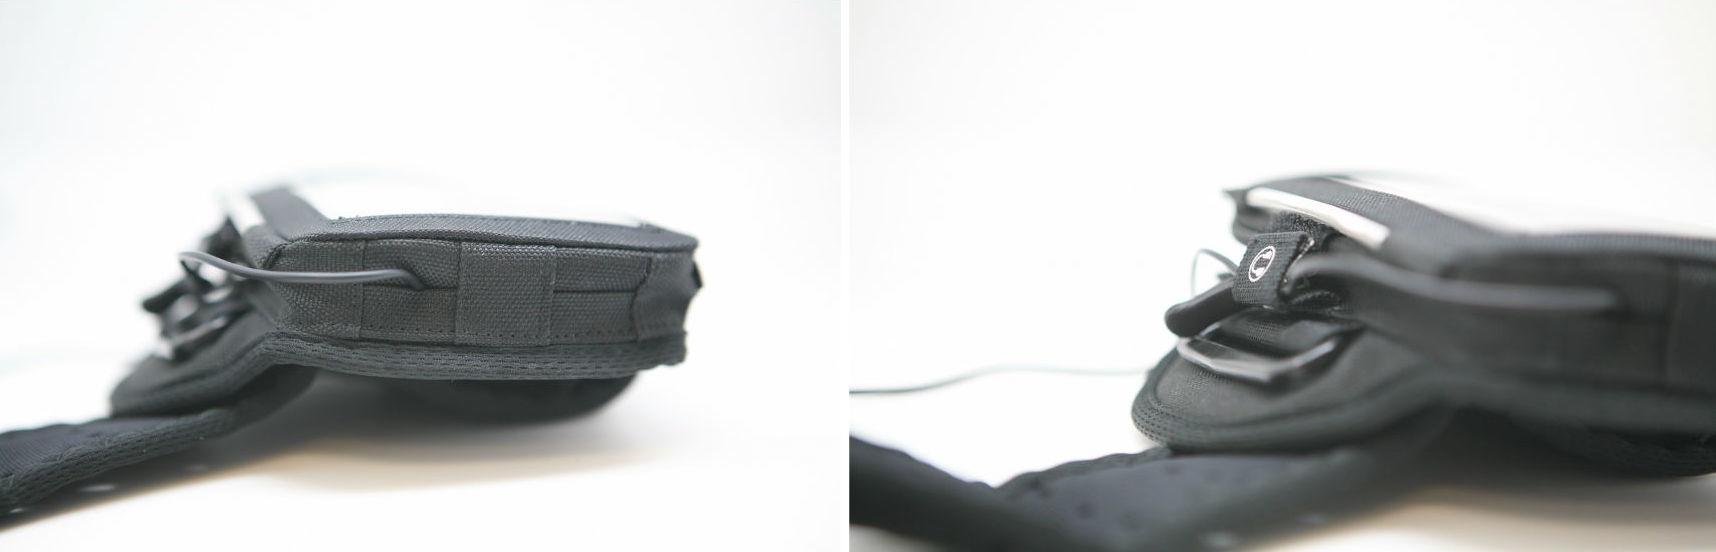 Сверкающий чехол для смартфонов: знакомимся с брендом Armpocket - 7